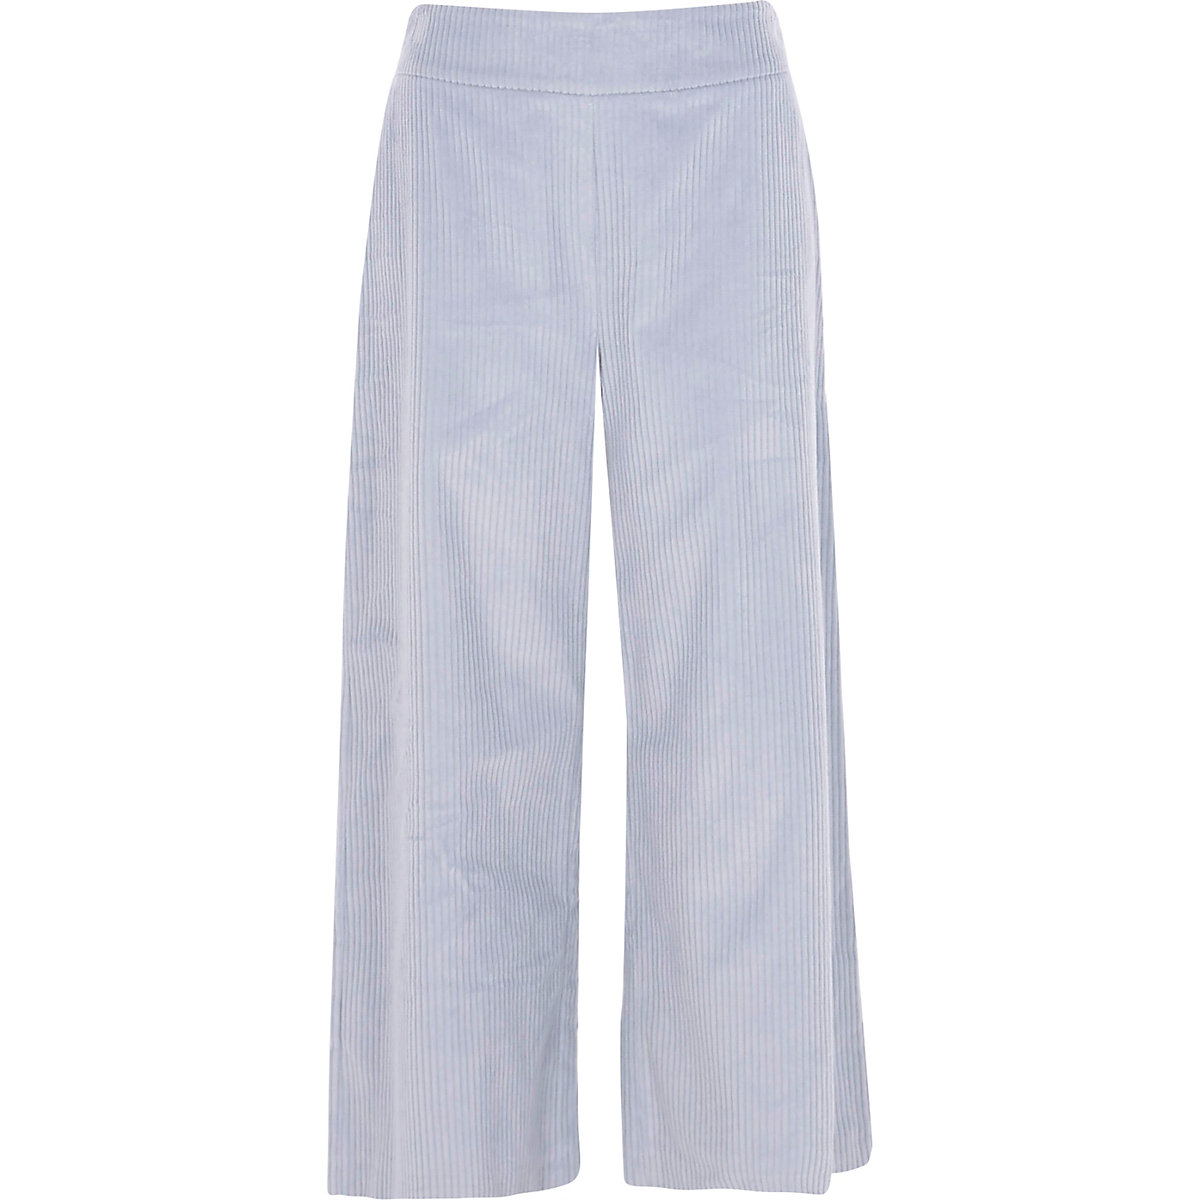 Light blue corduroy culottes